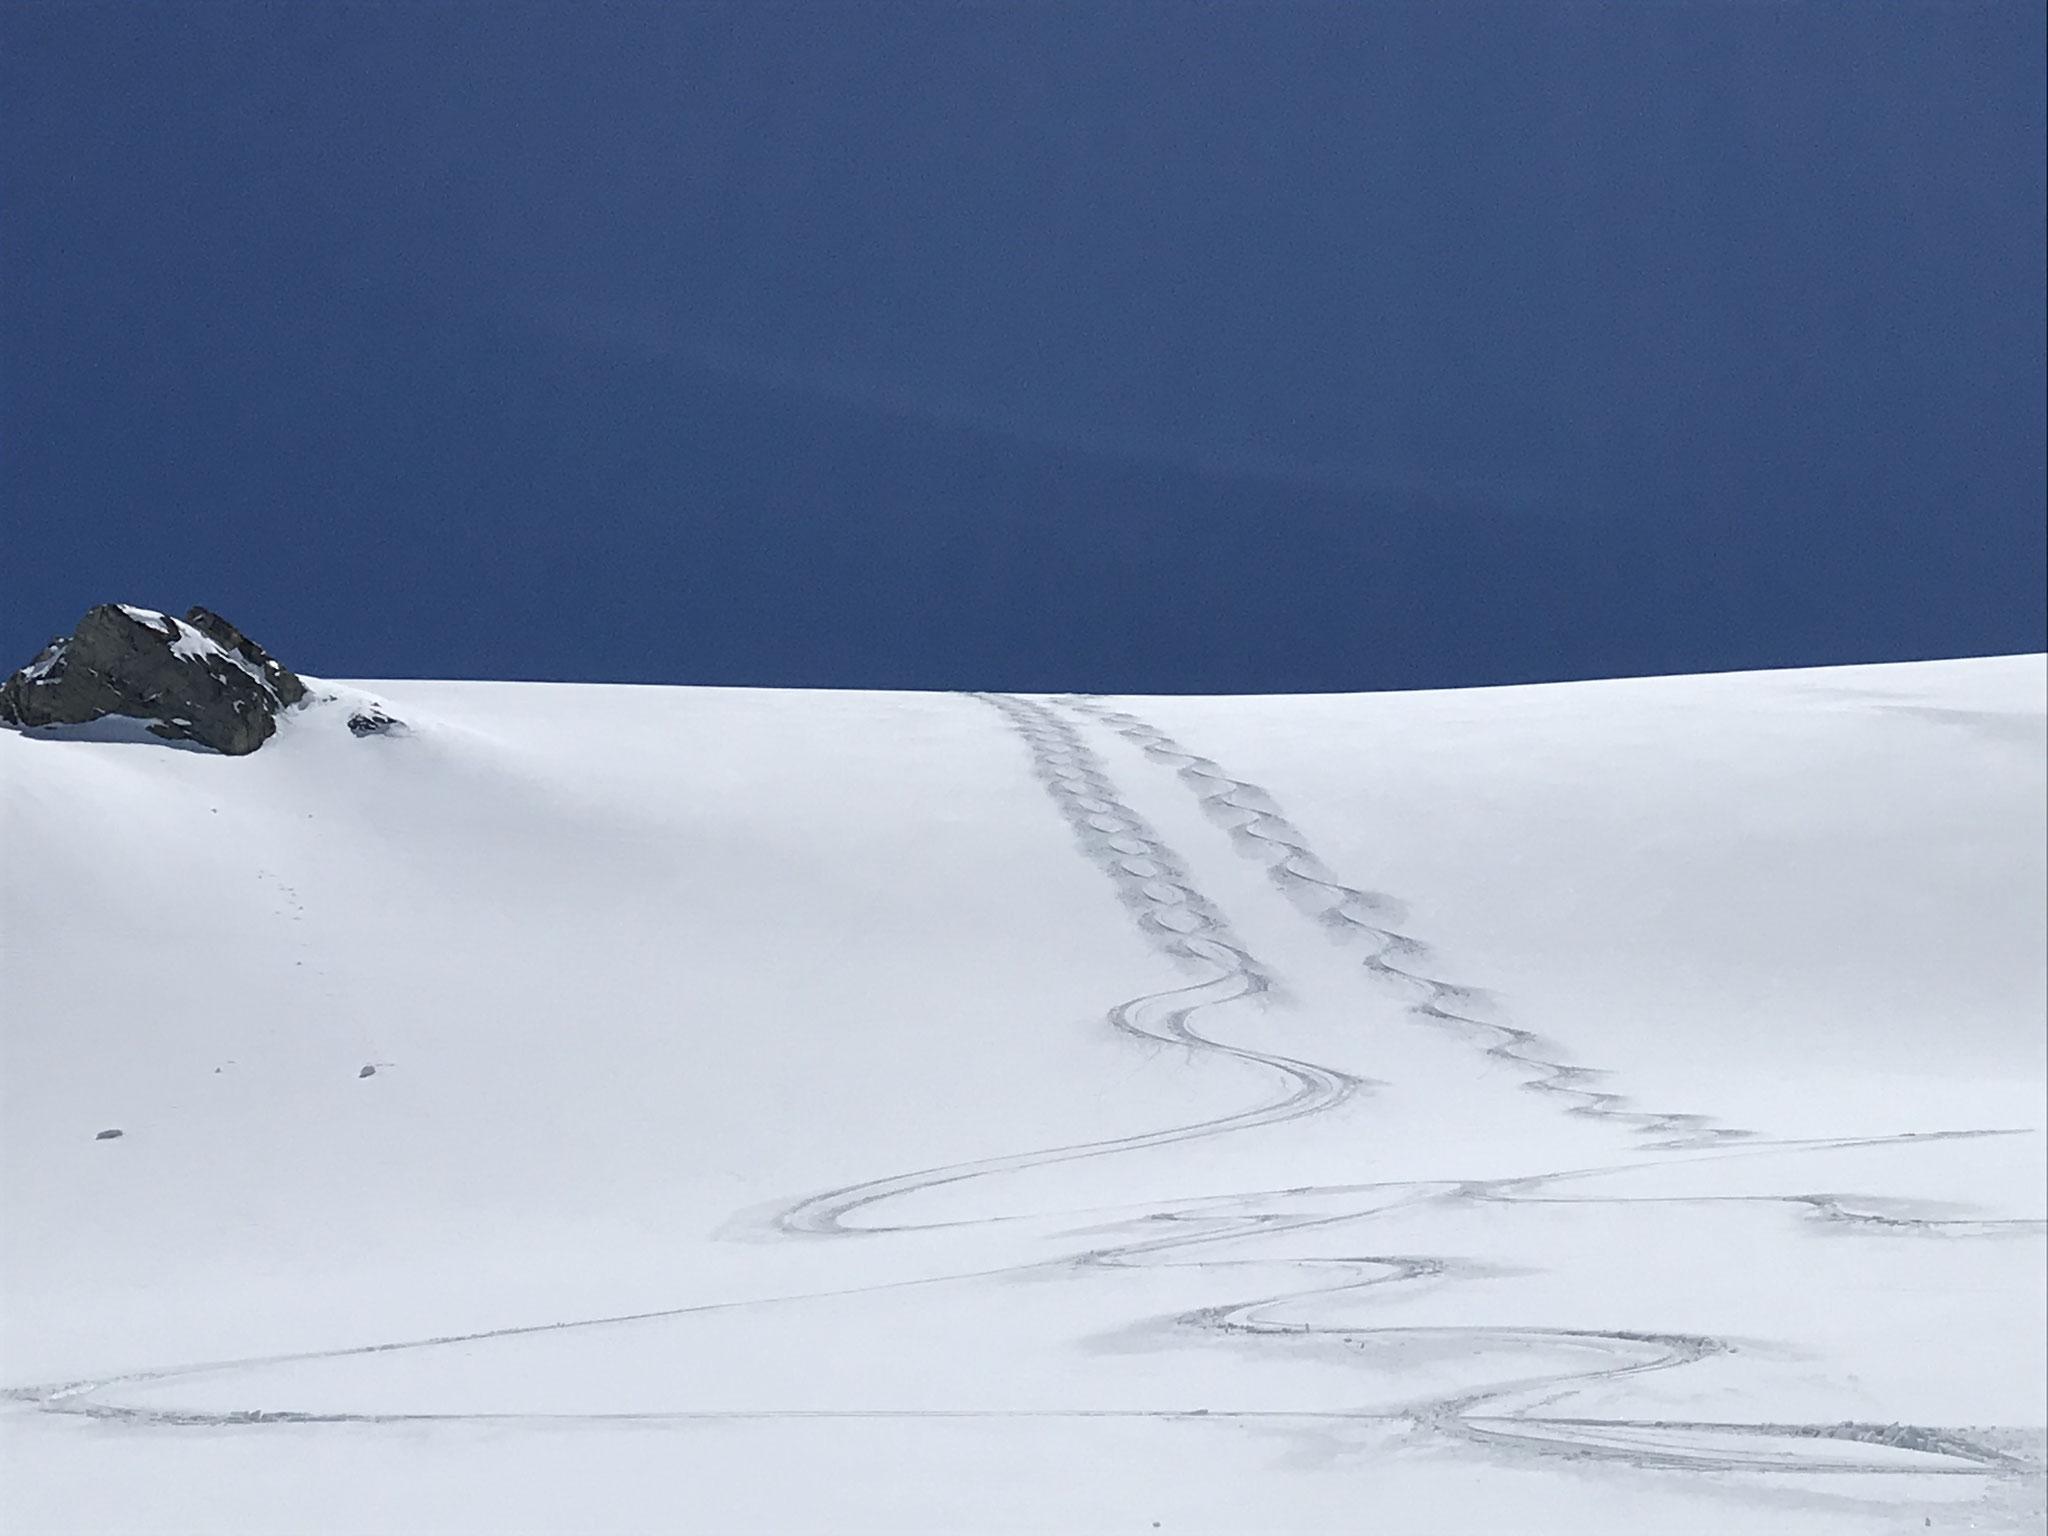 Perfekt Abfahrtsbedingungen am Jamtalferner - Silvretta